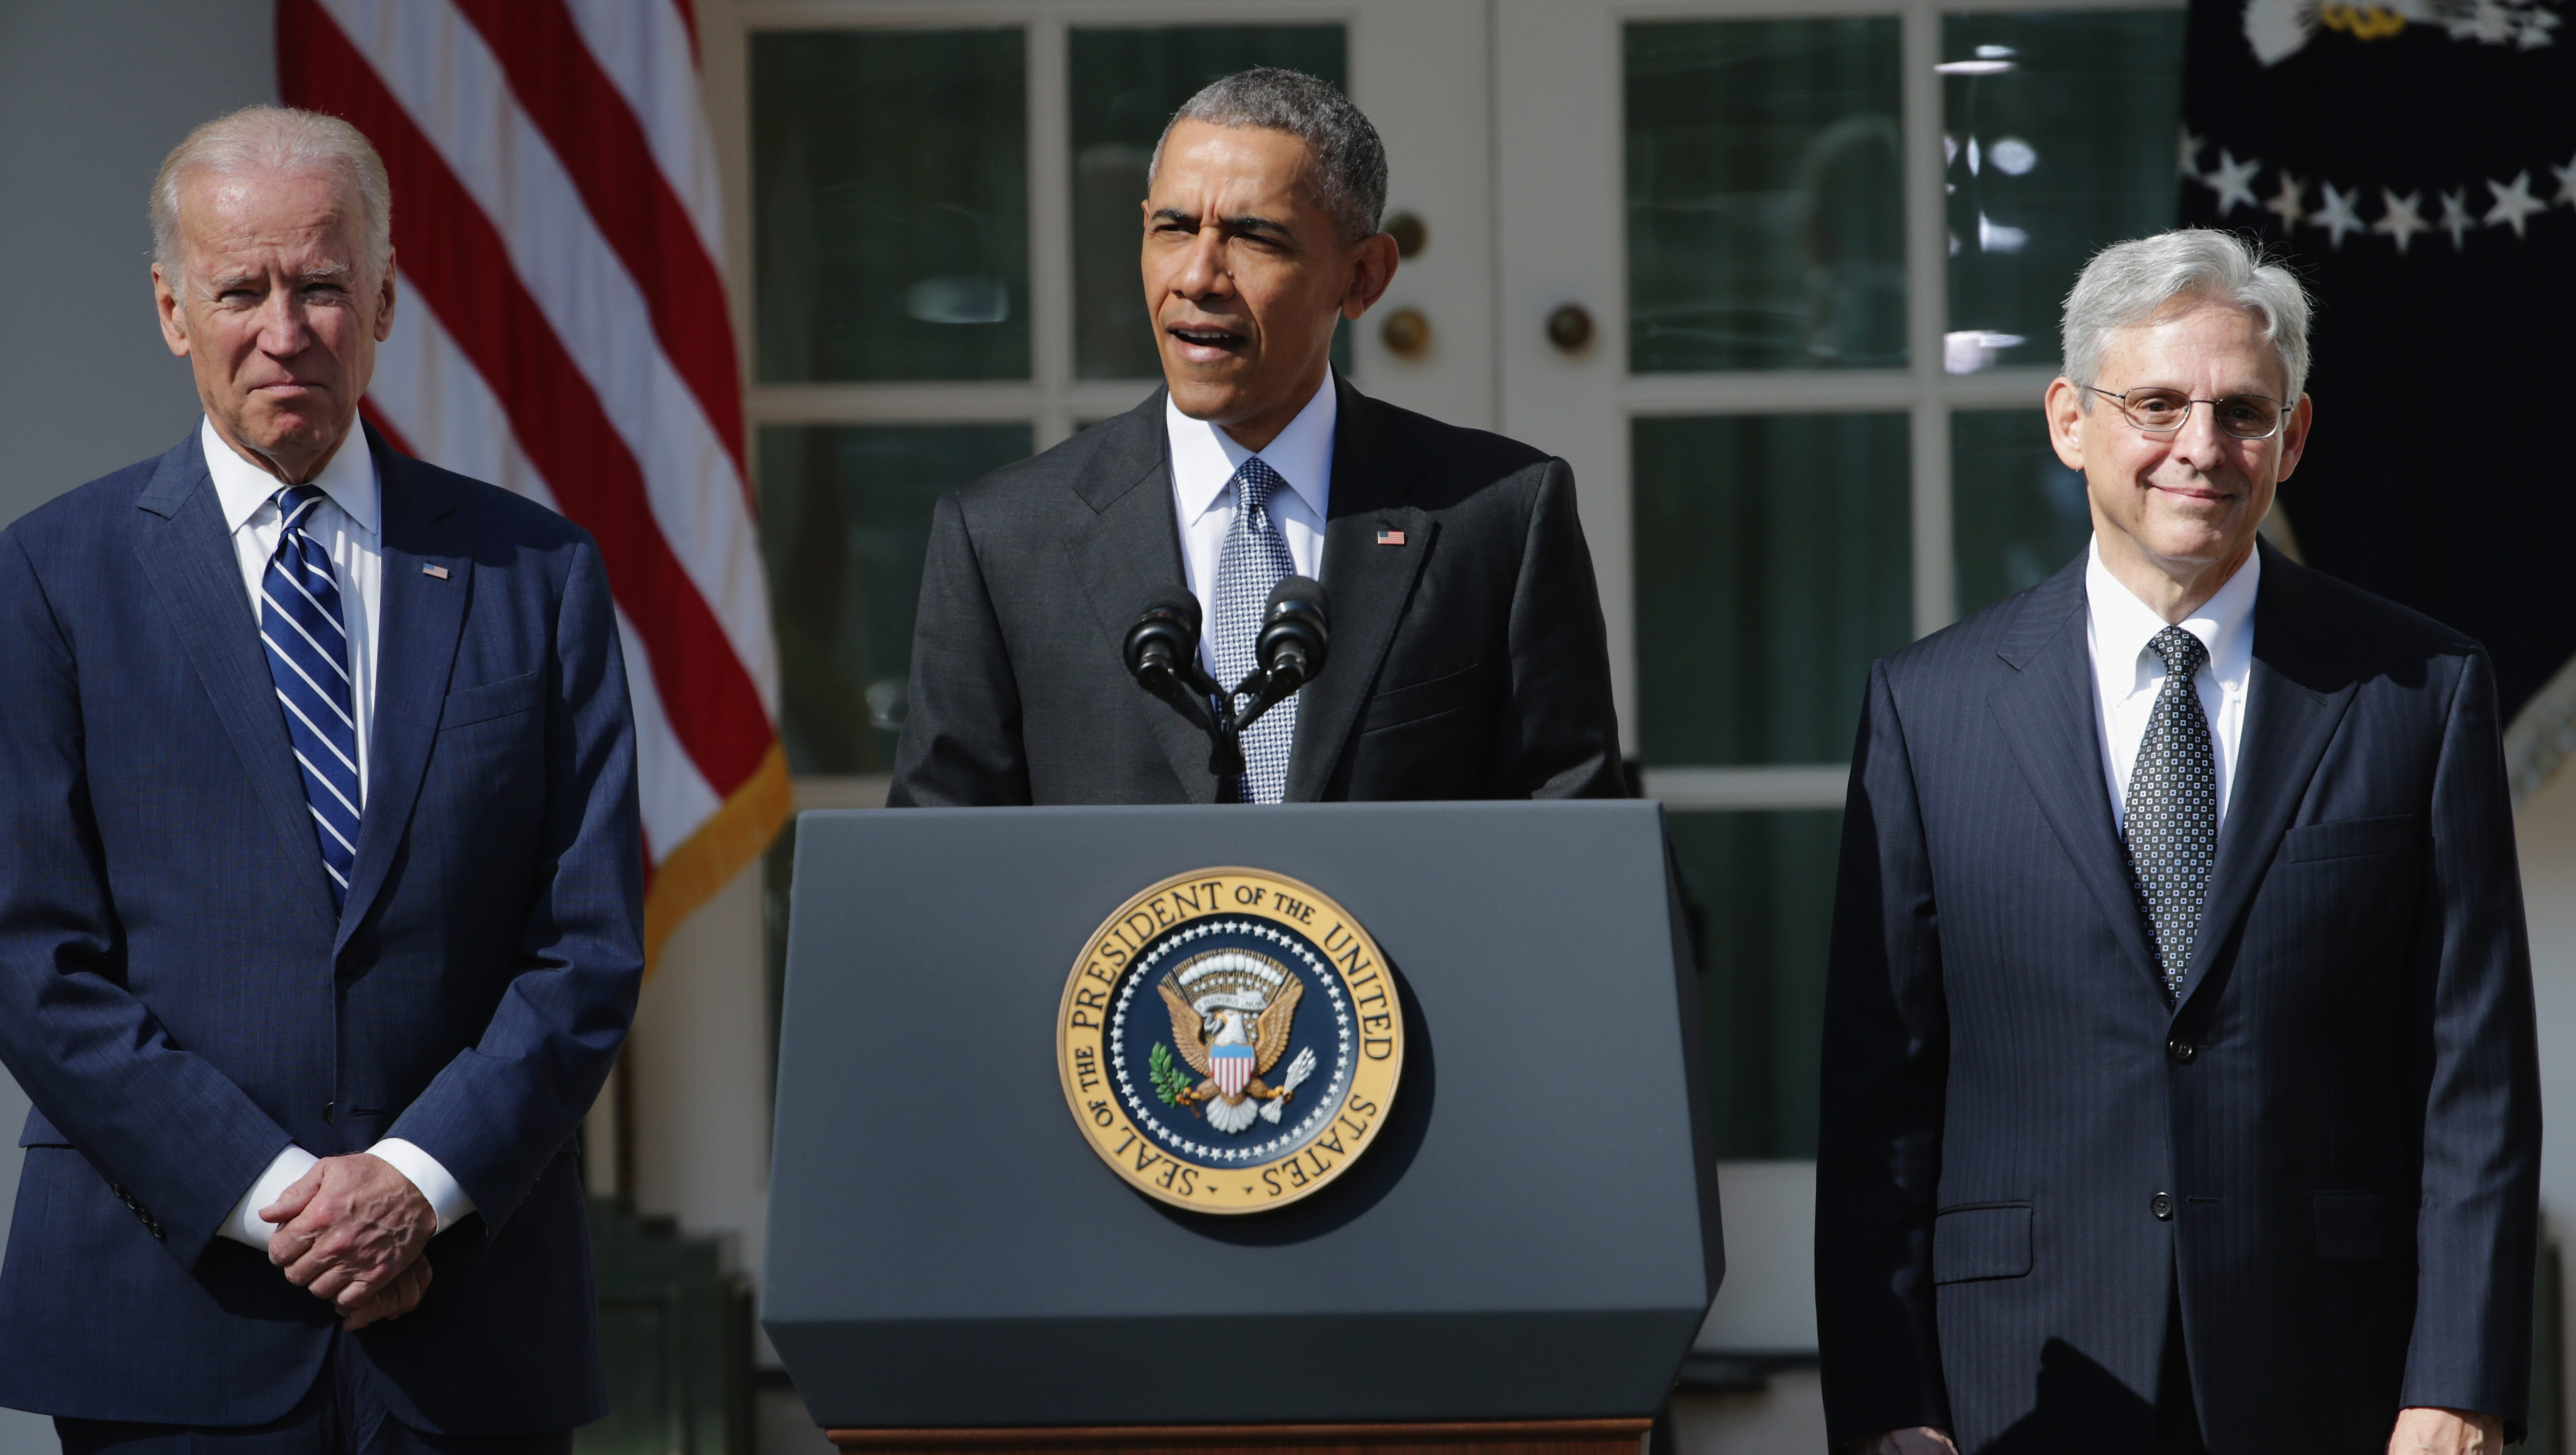 Obama: Merrick Garland qualified to serve on Supreme Court immediately